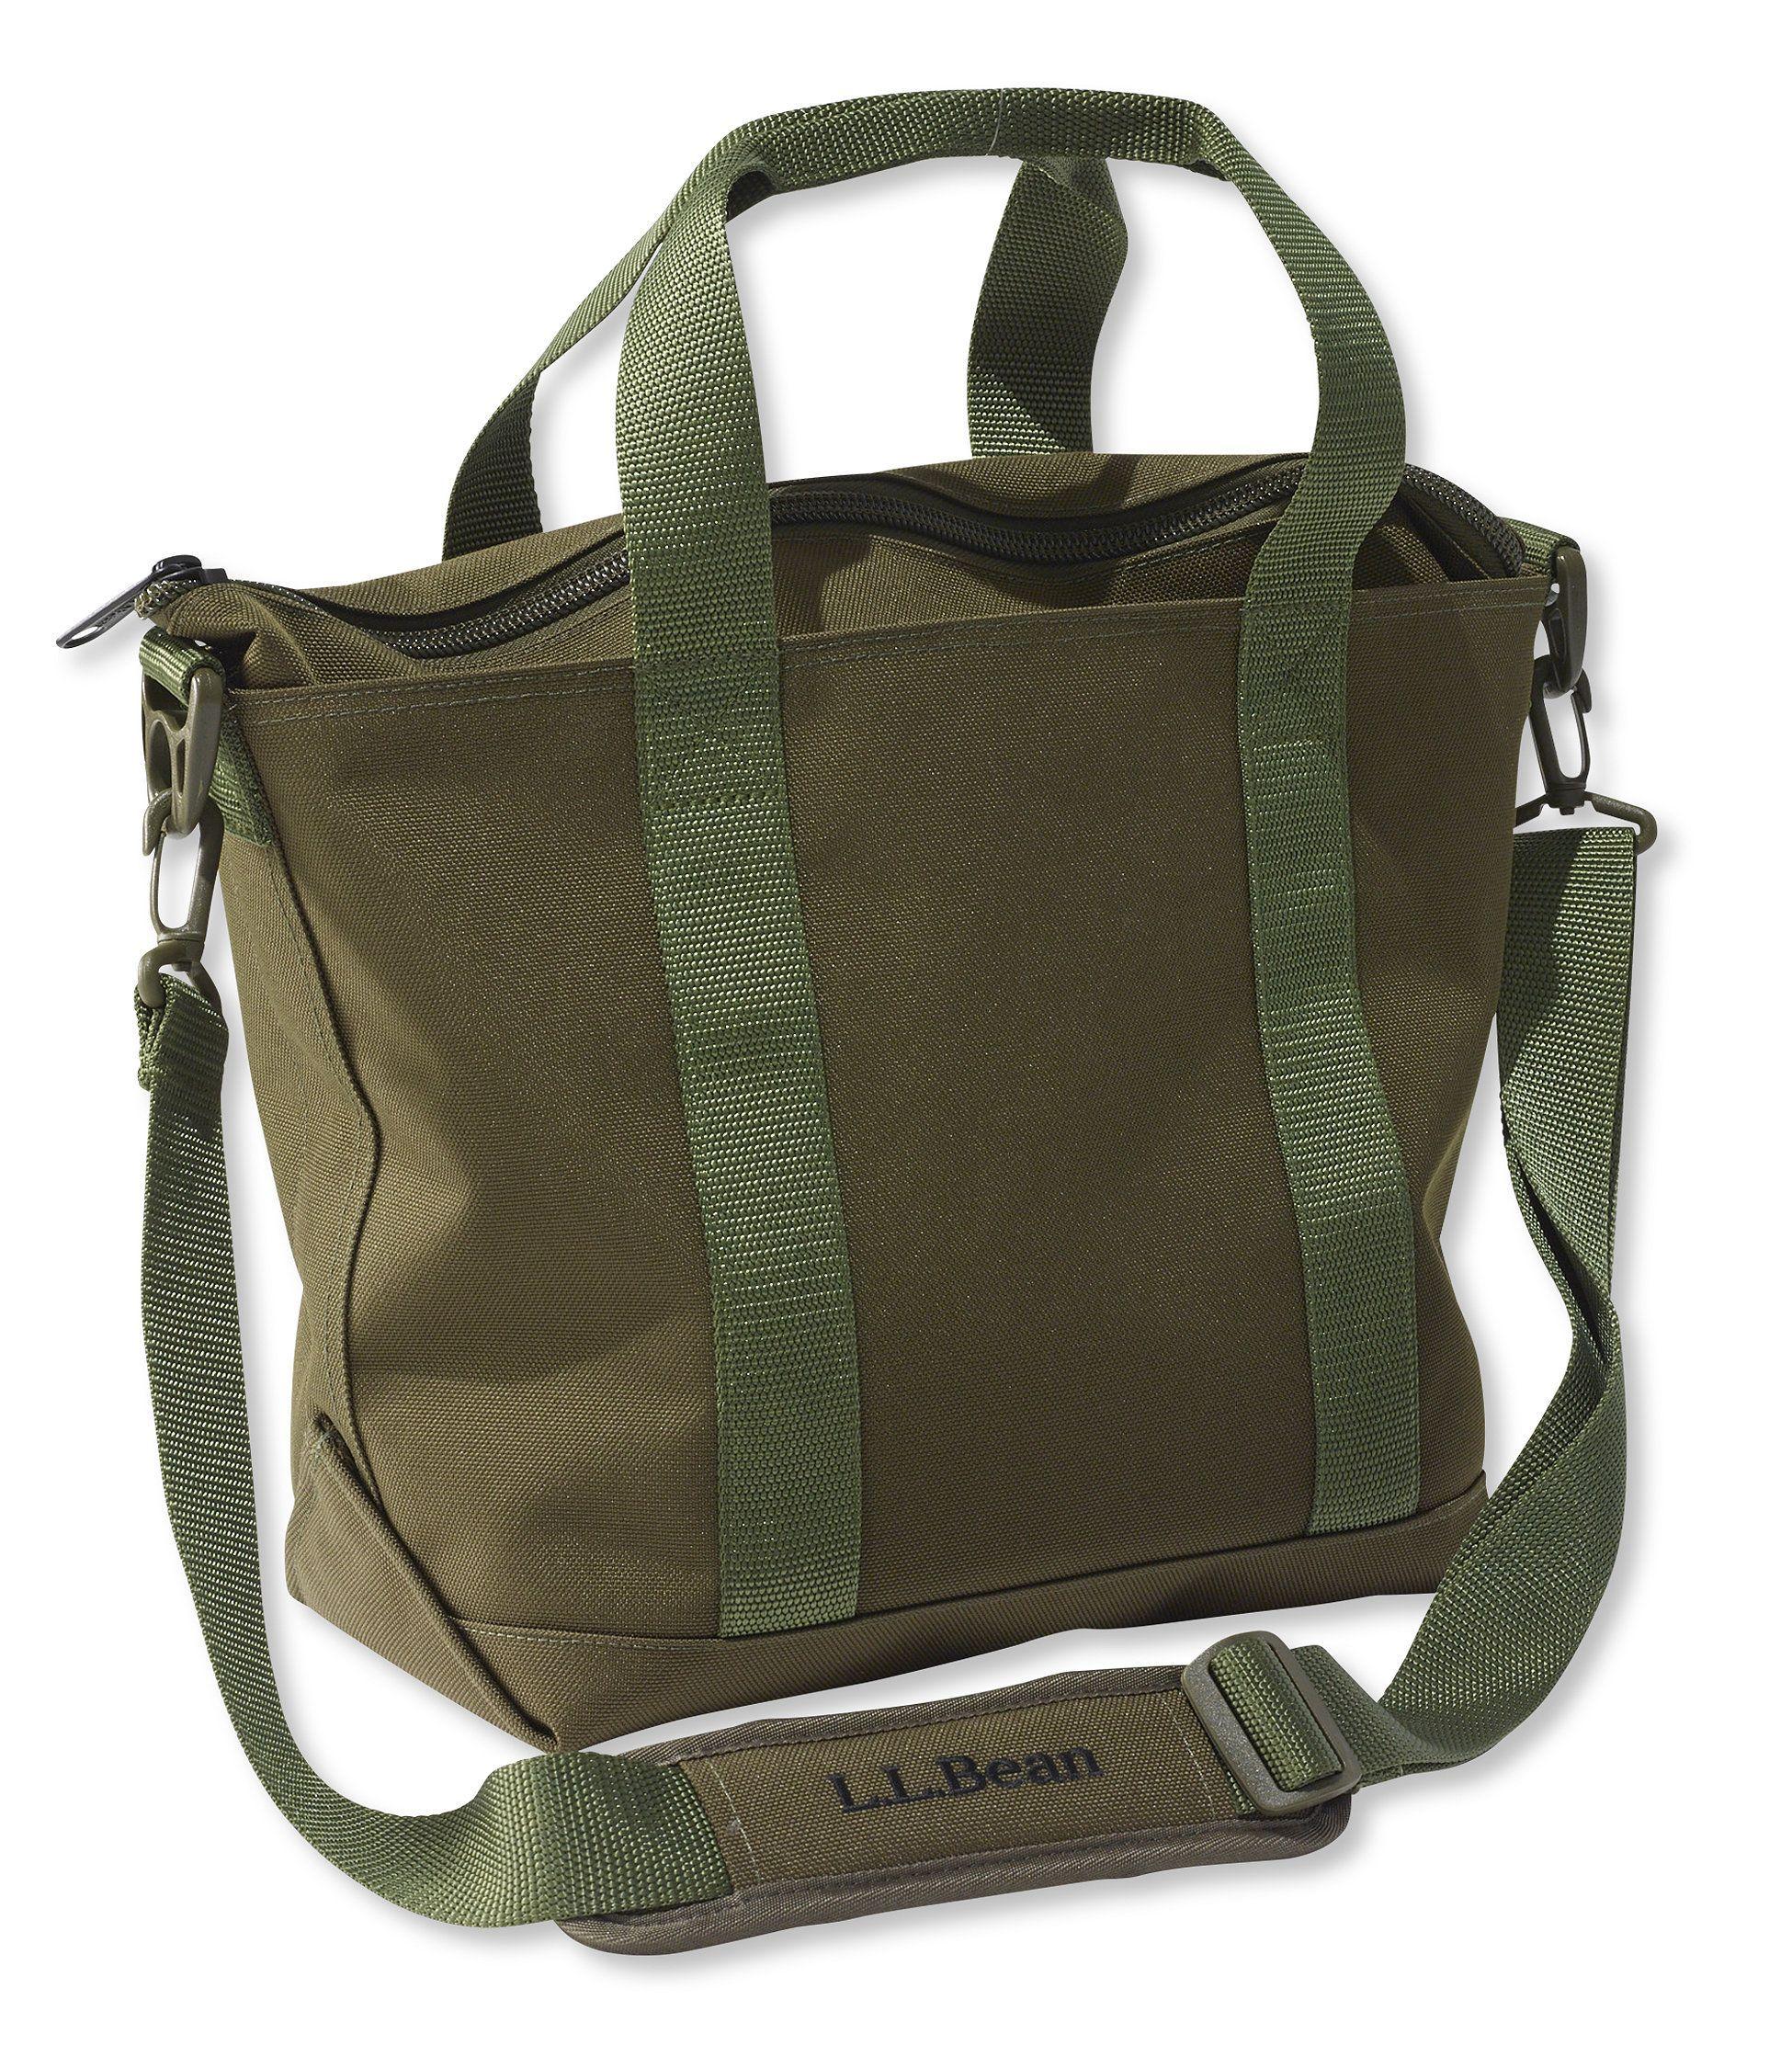 00aff305a5 Hunter s Tote Bag. Hunter s Tote Bag Best Carry ...